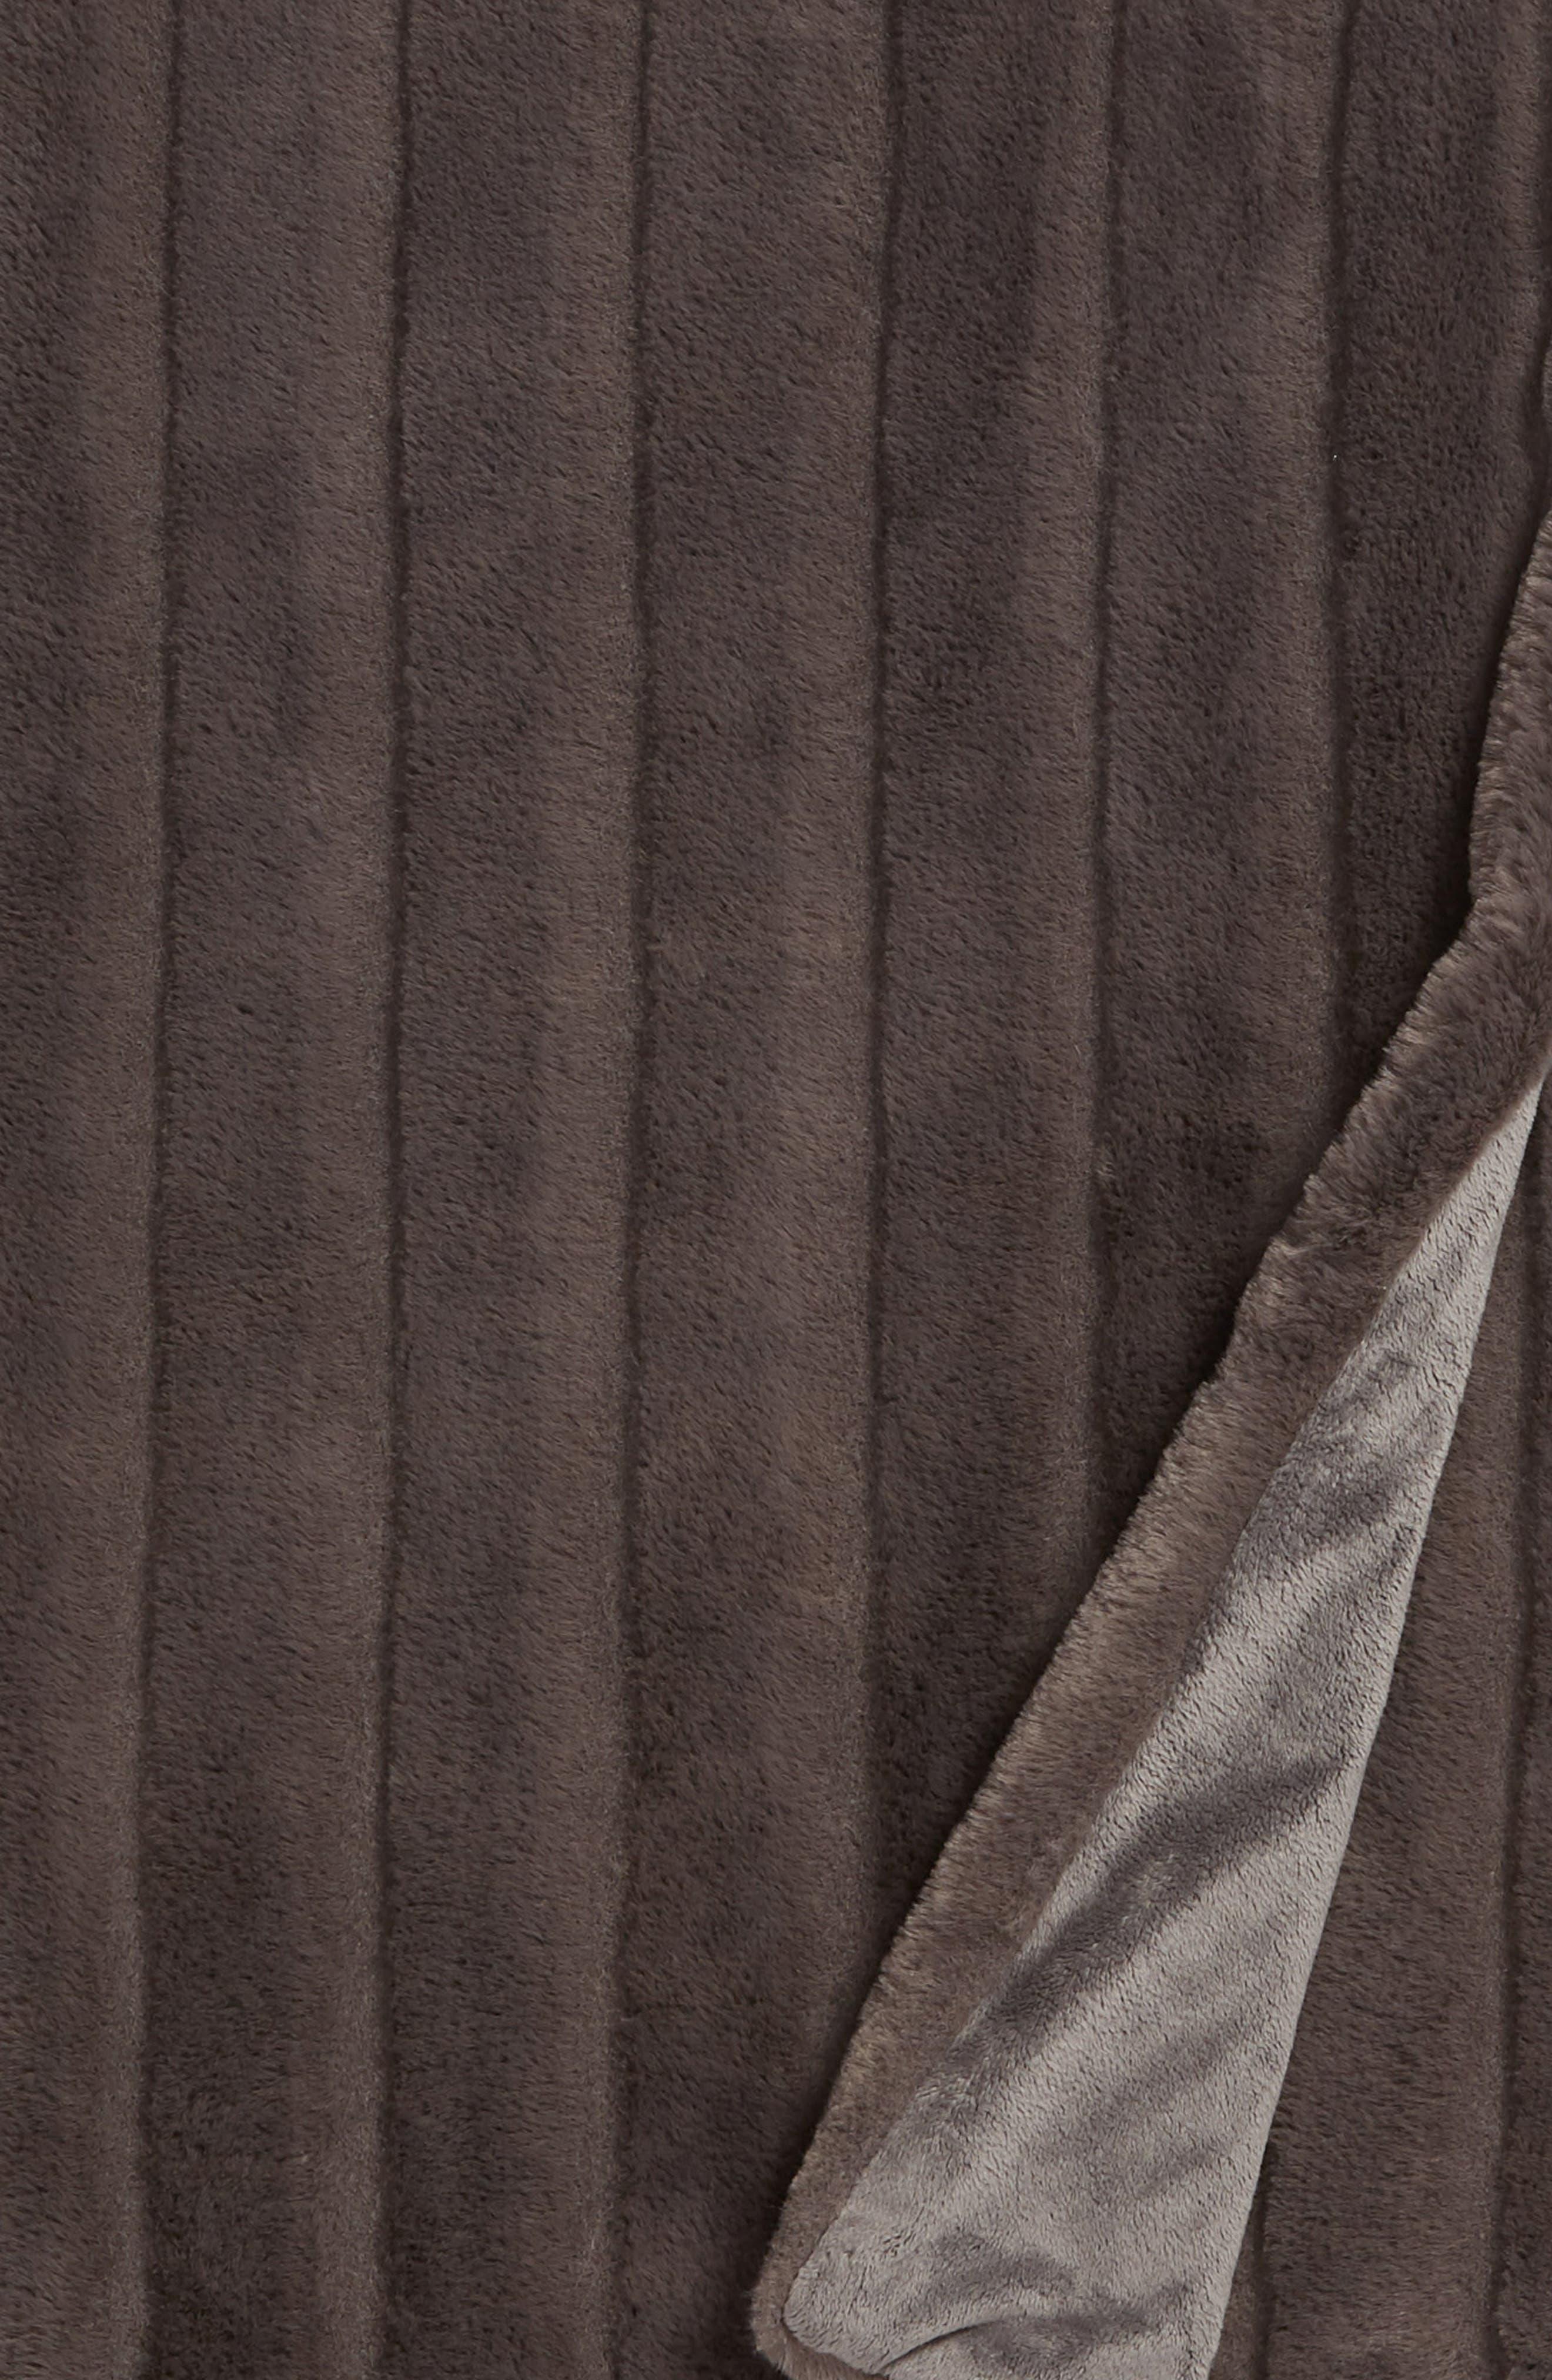 Sheared Stripe Faux Fur Throw,                             Alternate thumbnail 2, color,                             GREY MAGNET